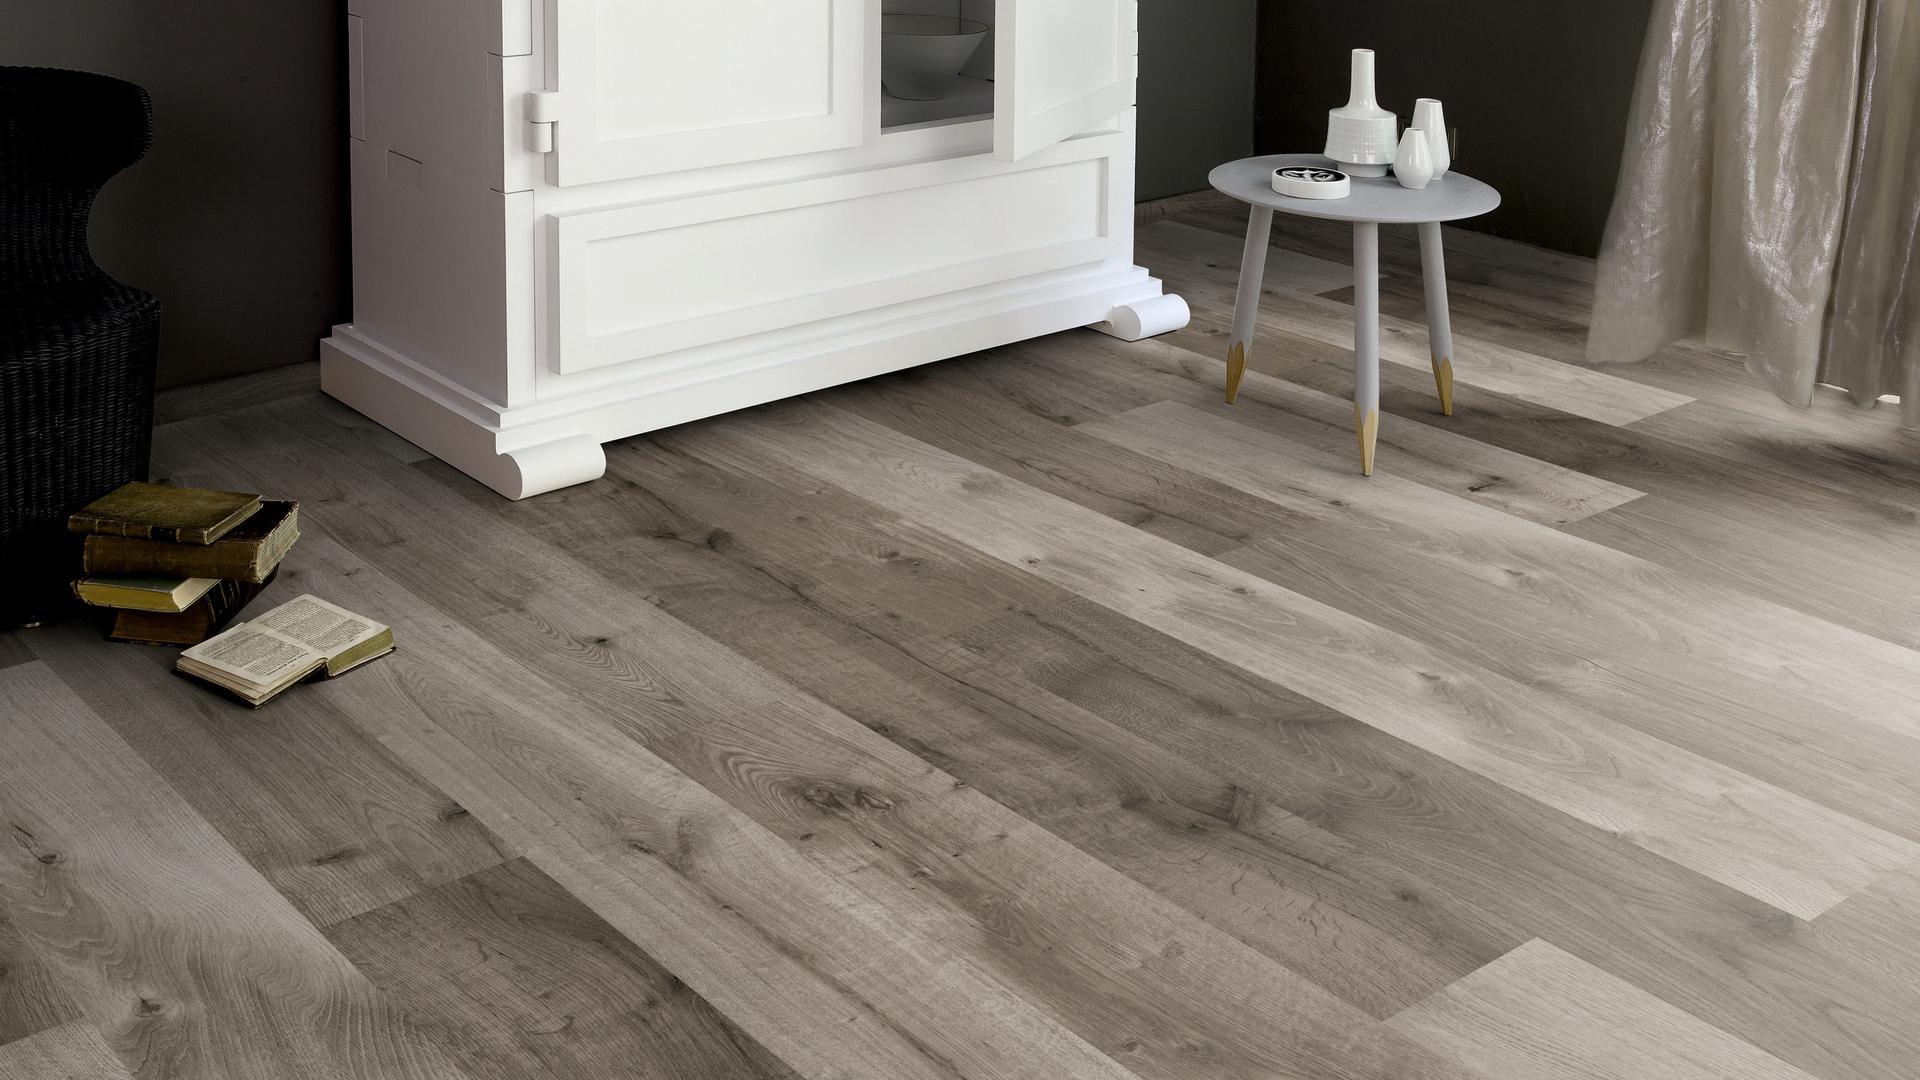 O522 Oak Uptown Hg High Gloss Floor Kaindl